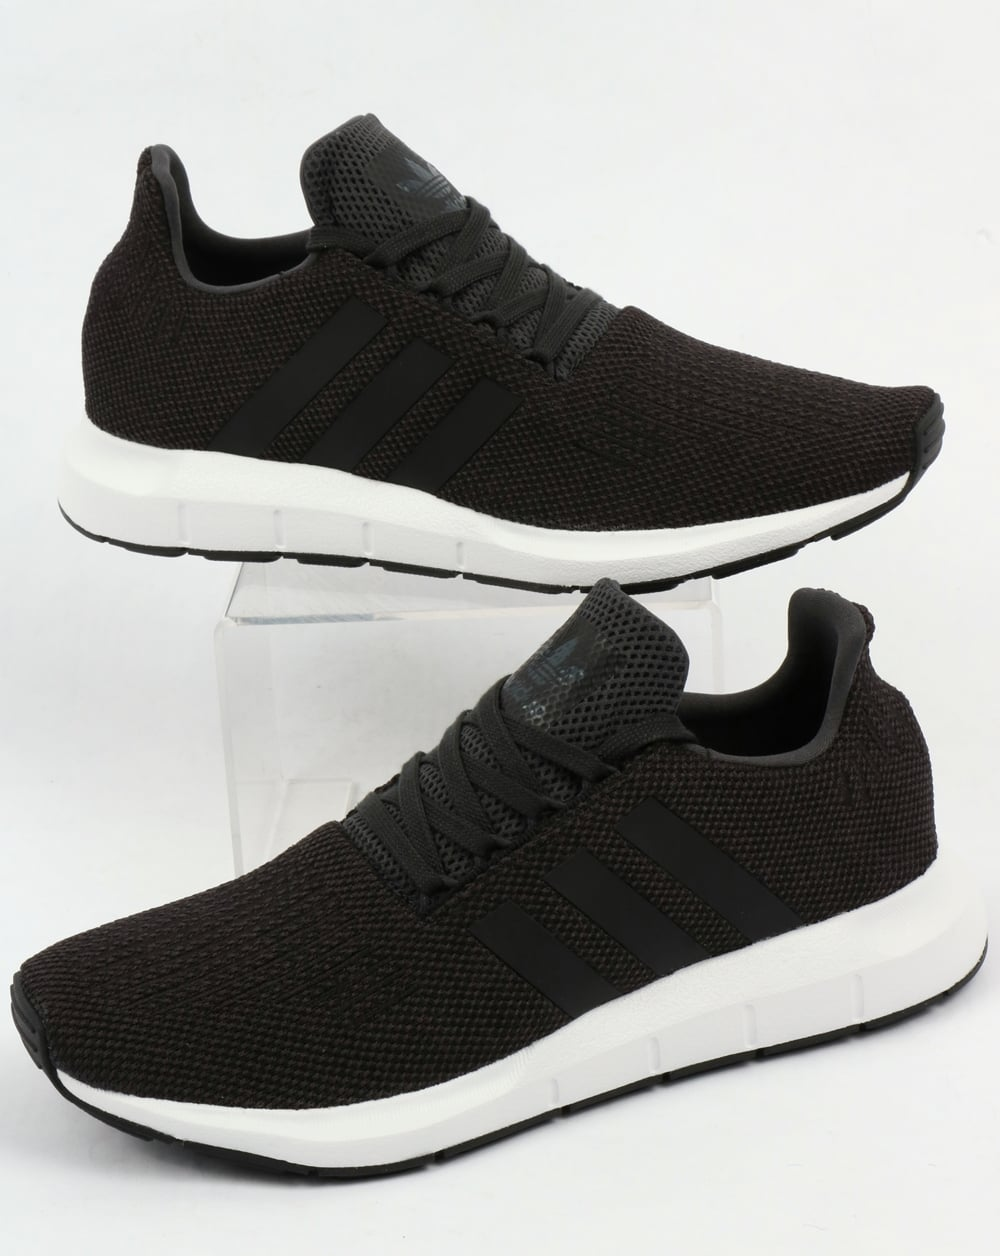 Adidas Swift Run Trainers Carbon/Black